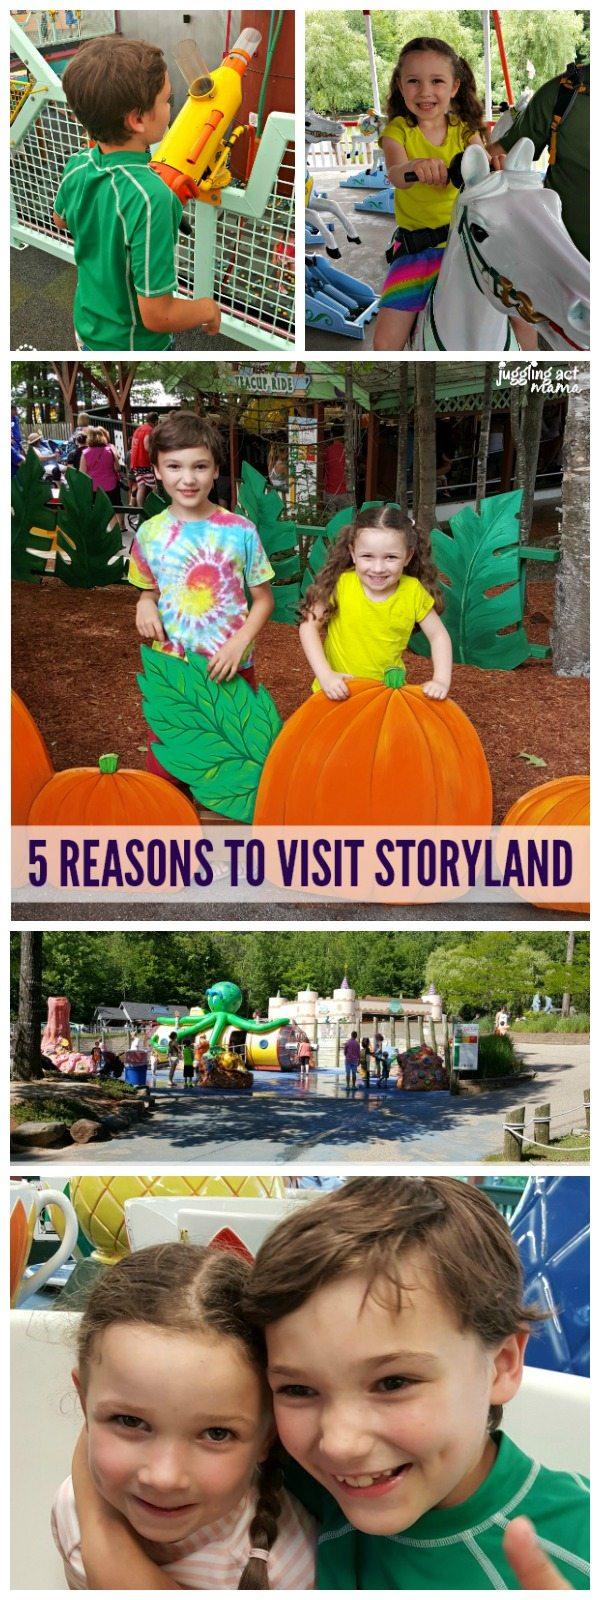 Top 5 Reasons to Visit StoryLand #Sponsored #StoryLandNH #MyStoryLandAdventure #WhiteMountains #NH